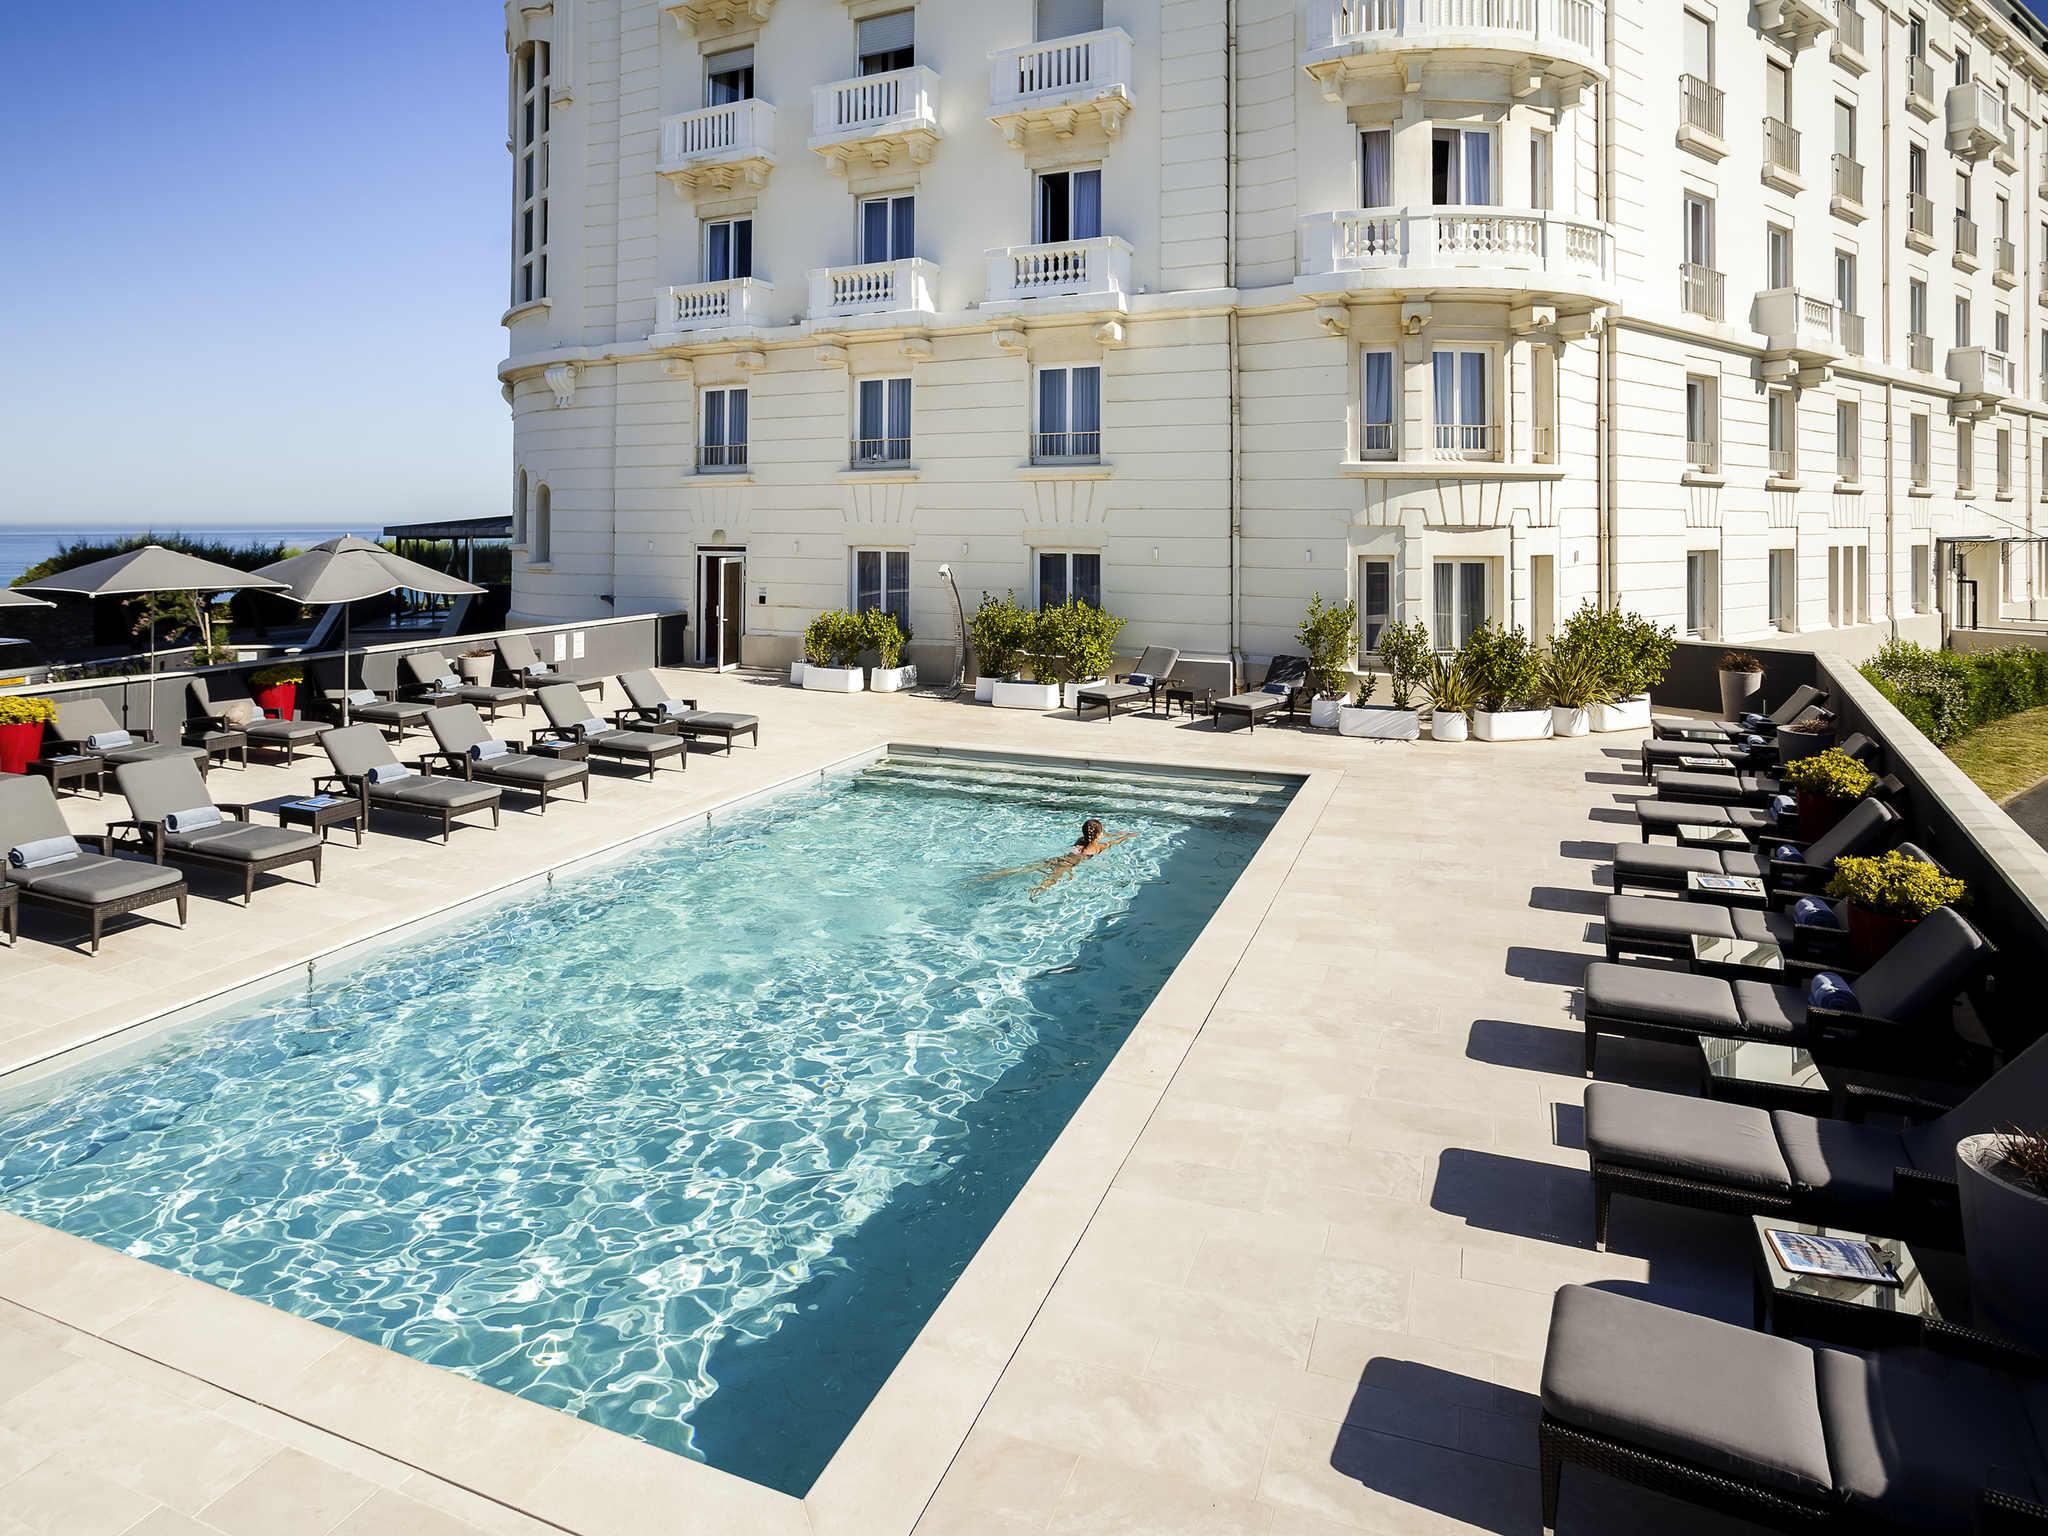 Hotel - Le Regina Biarritz Hotel & Spa - MGallery by Sofitel